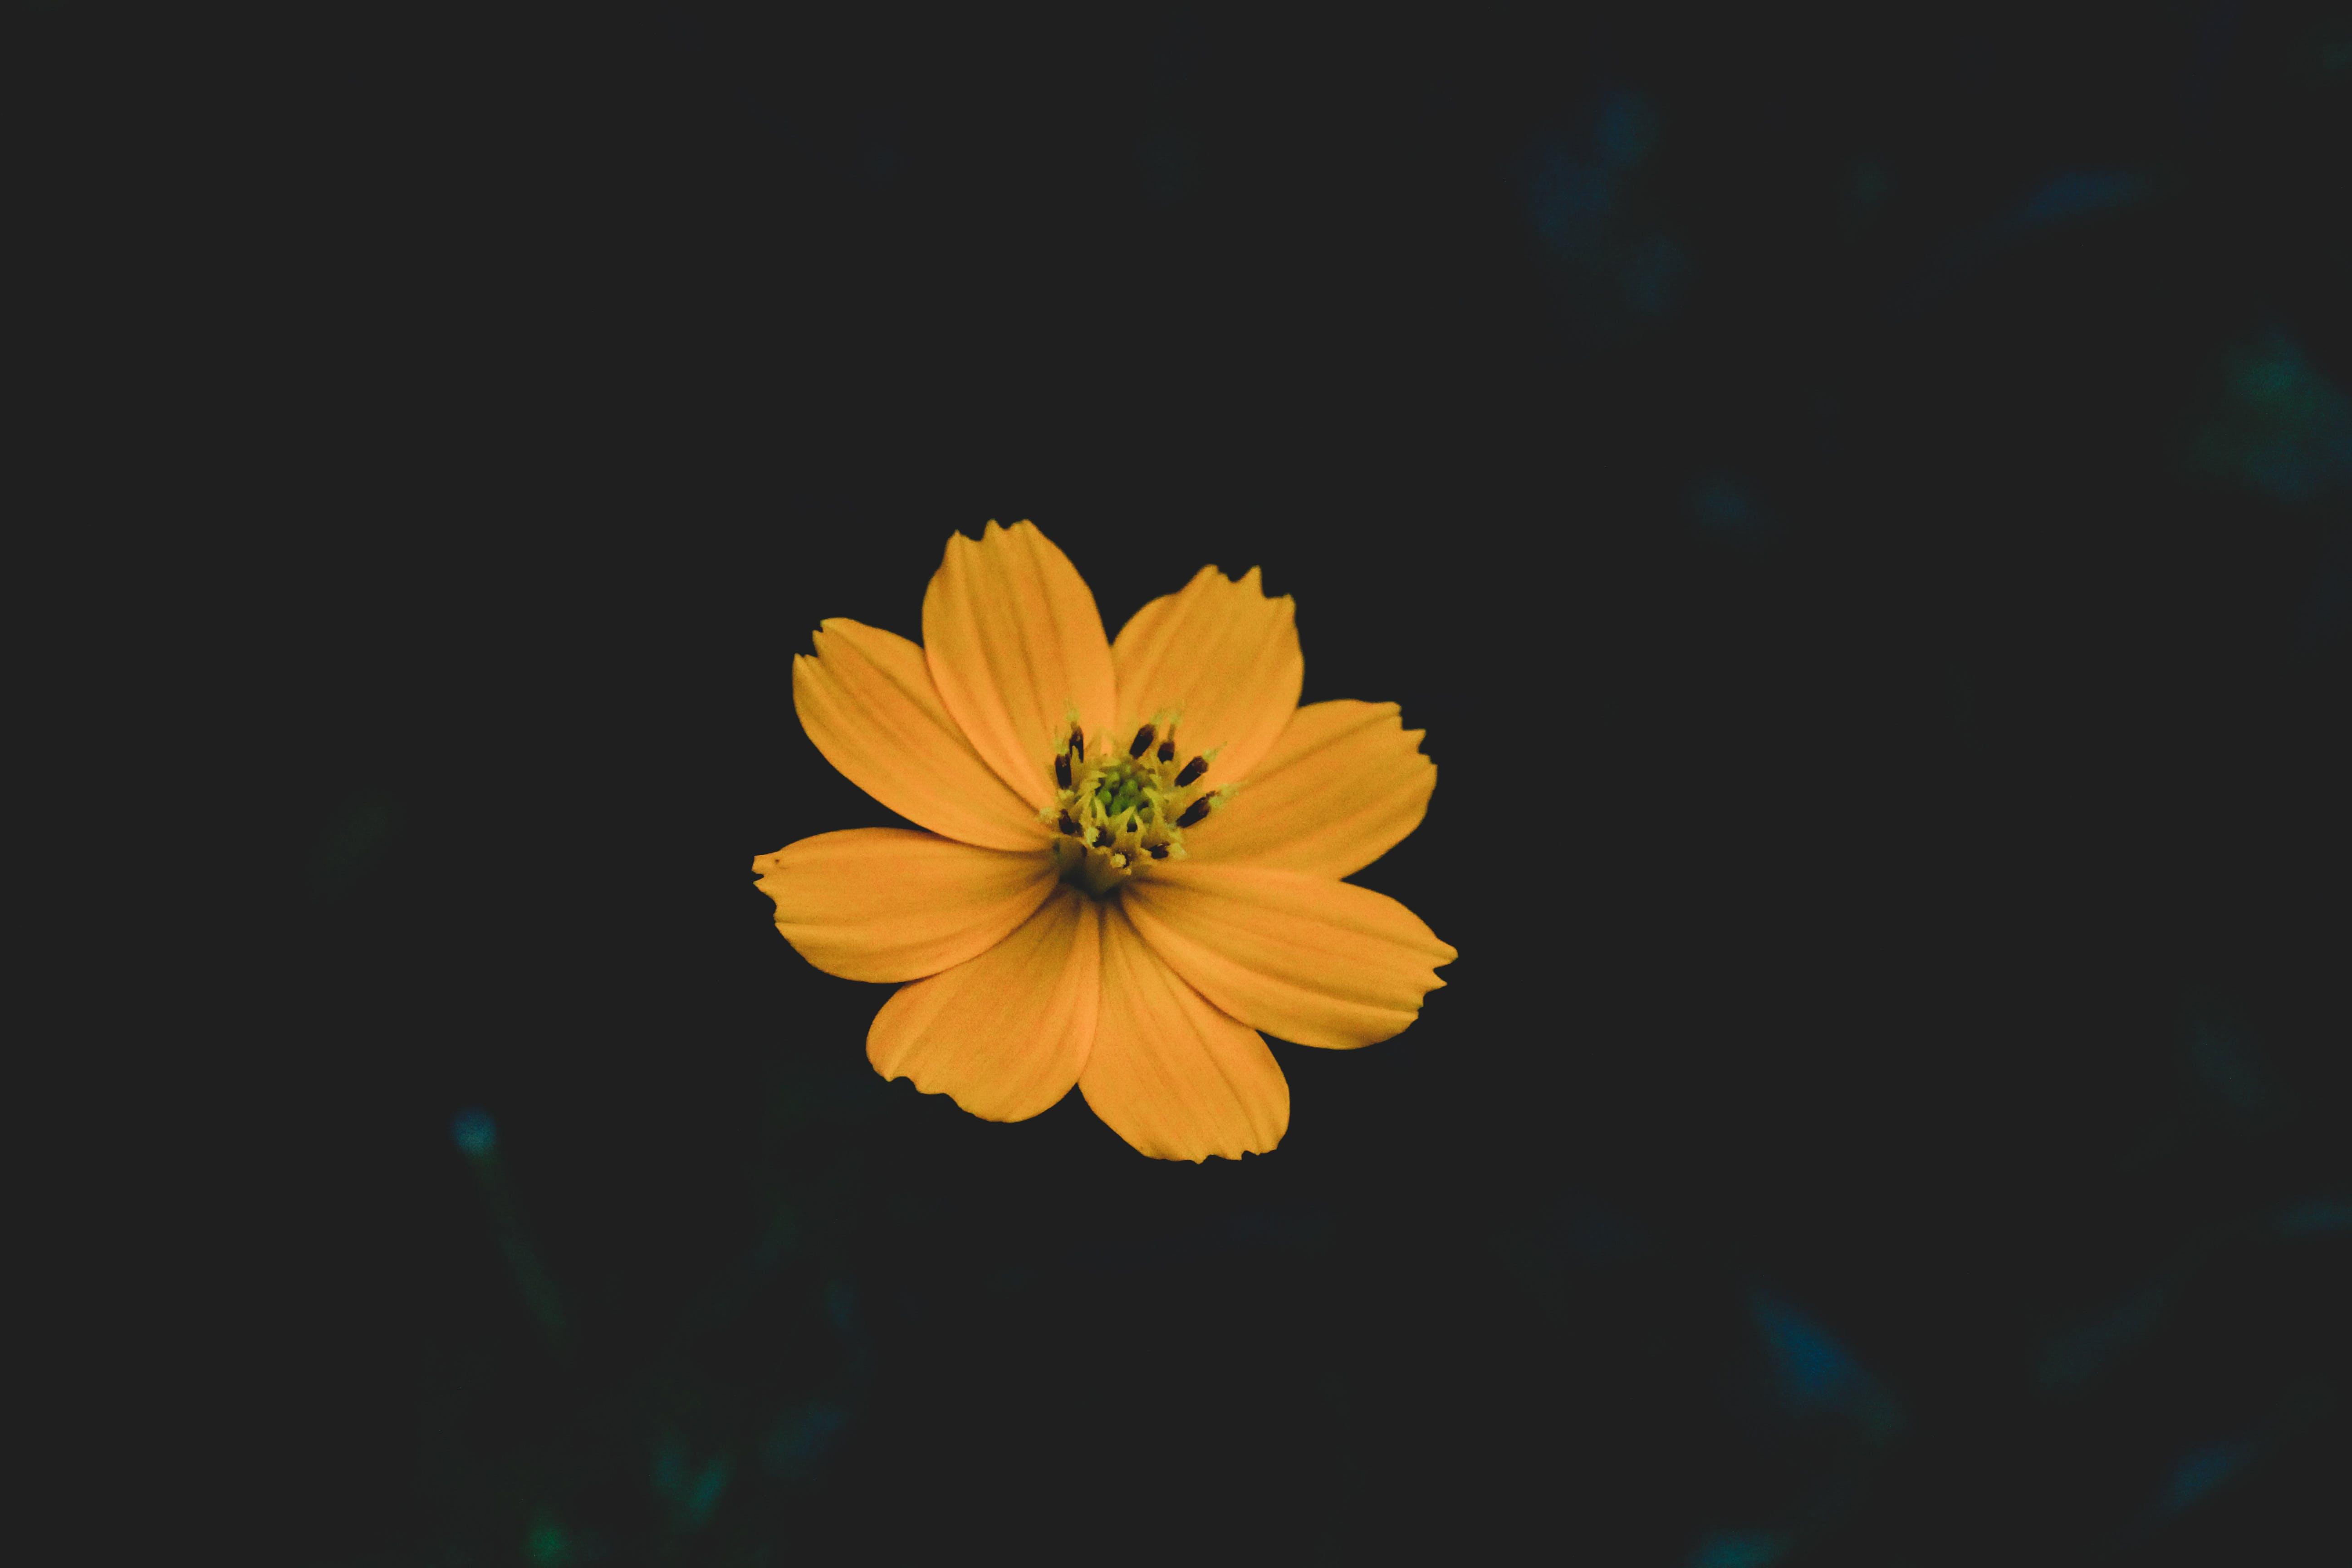 Selective Focus Photo of Yellow Cosmos Flower